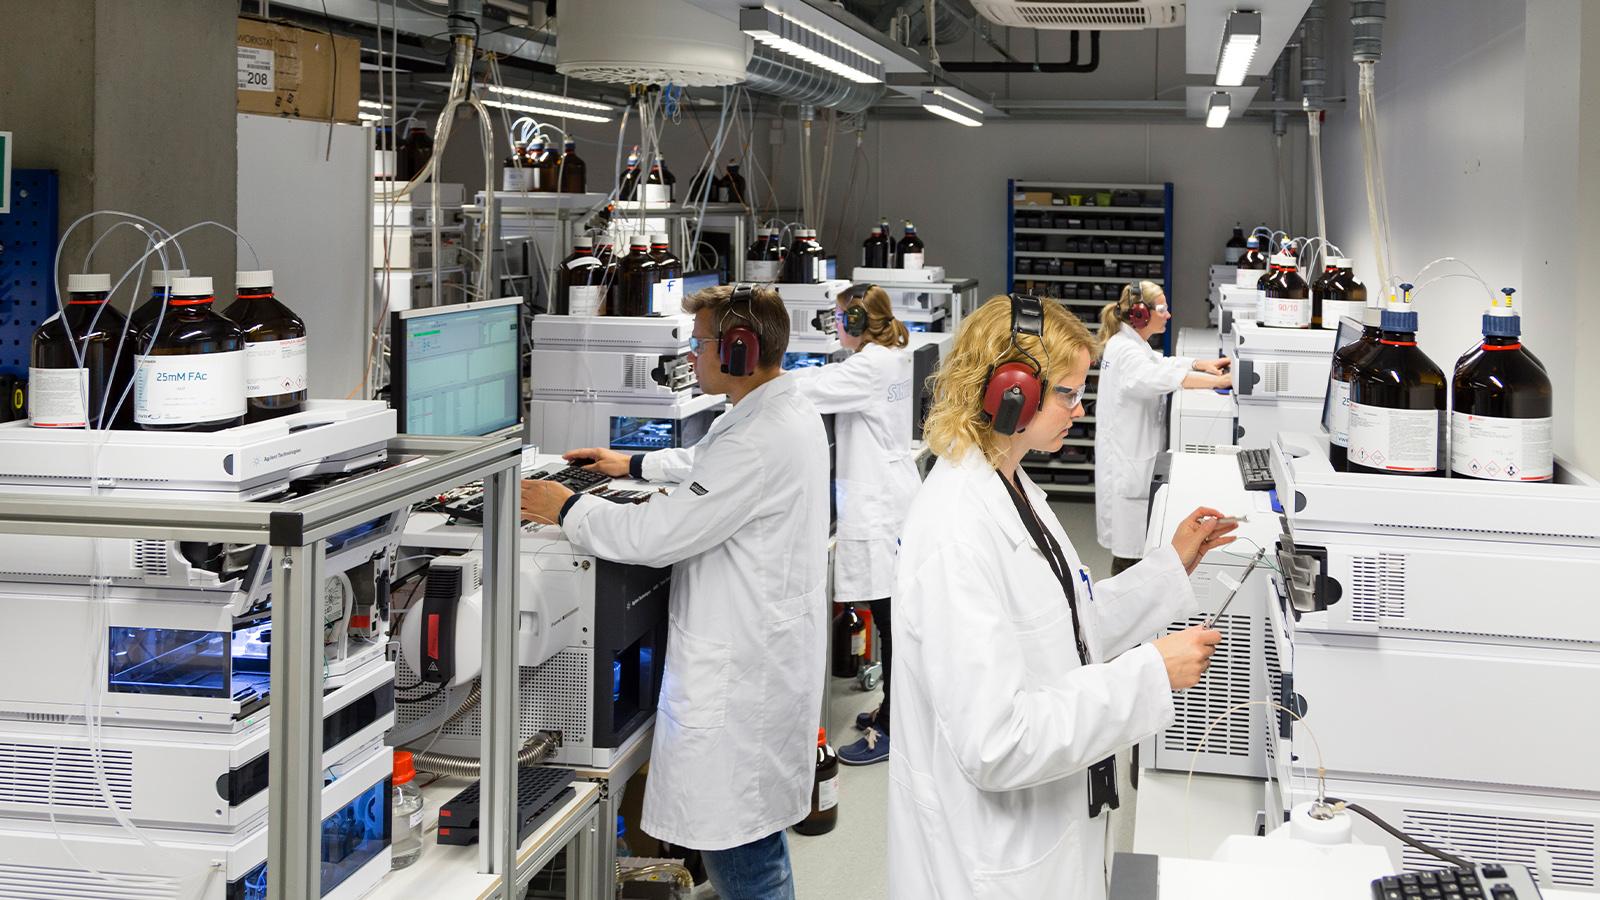 Methodological_needs_gaps_characterization_nanotechnology_based health products